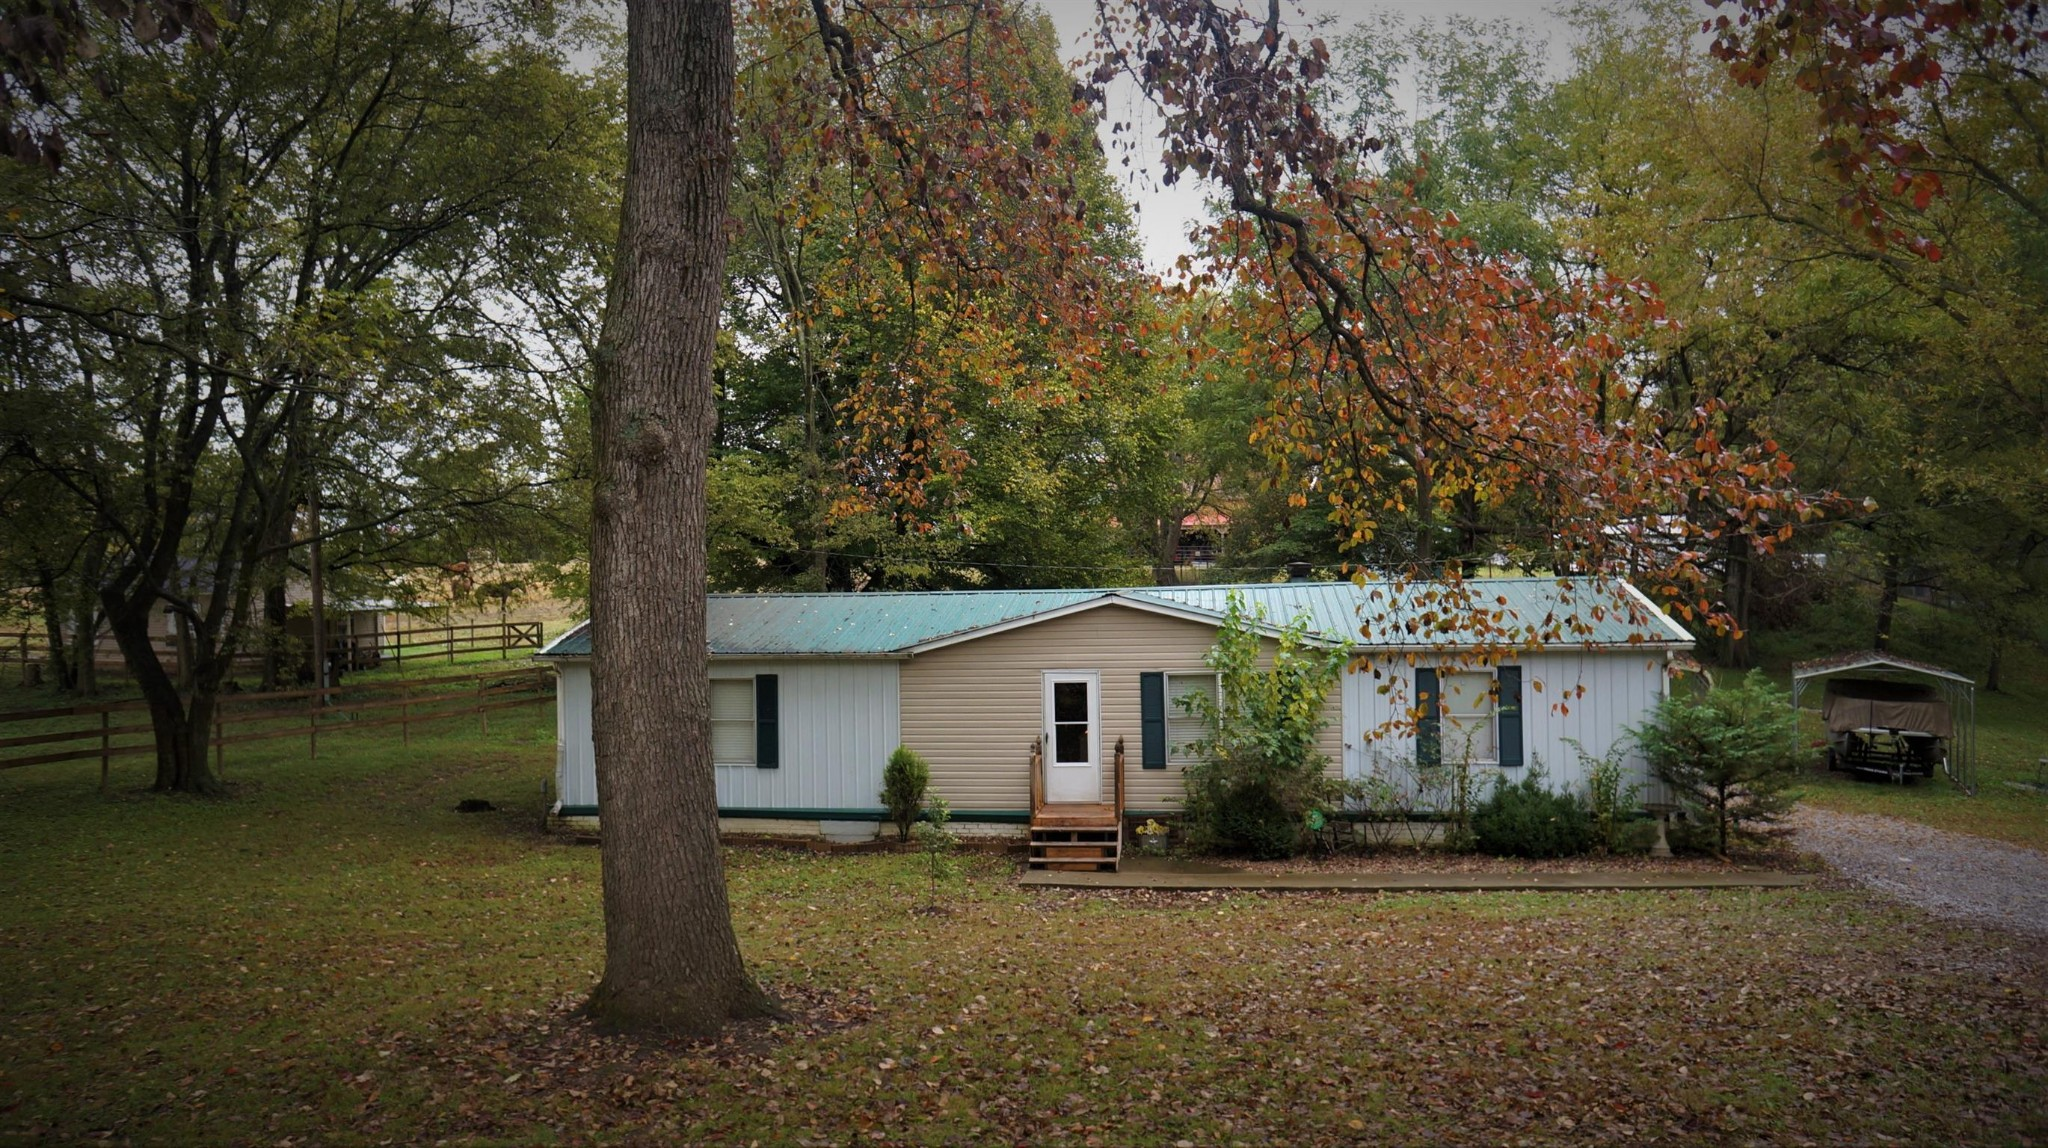 1389 Good Hope Cemetery Rd, Oak Grove, KY 42262 - Oak Grove, KY real estate listing